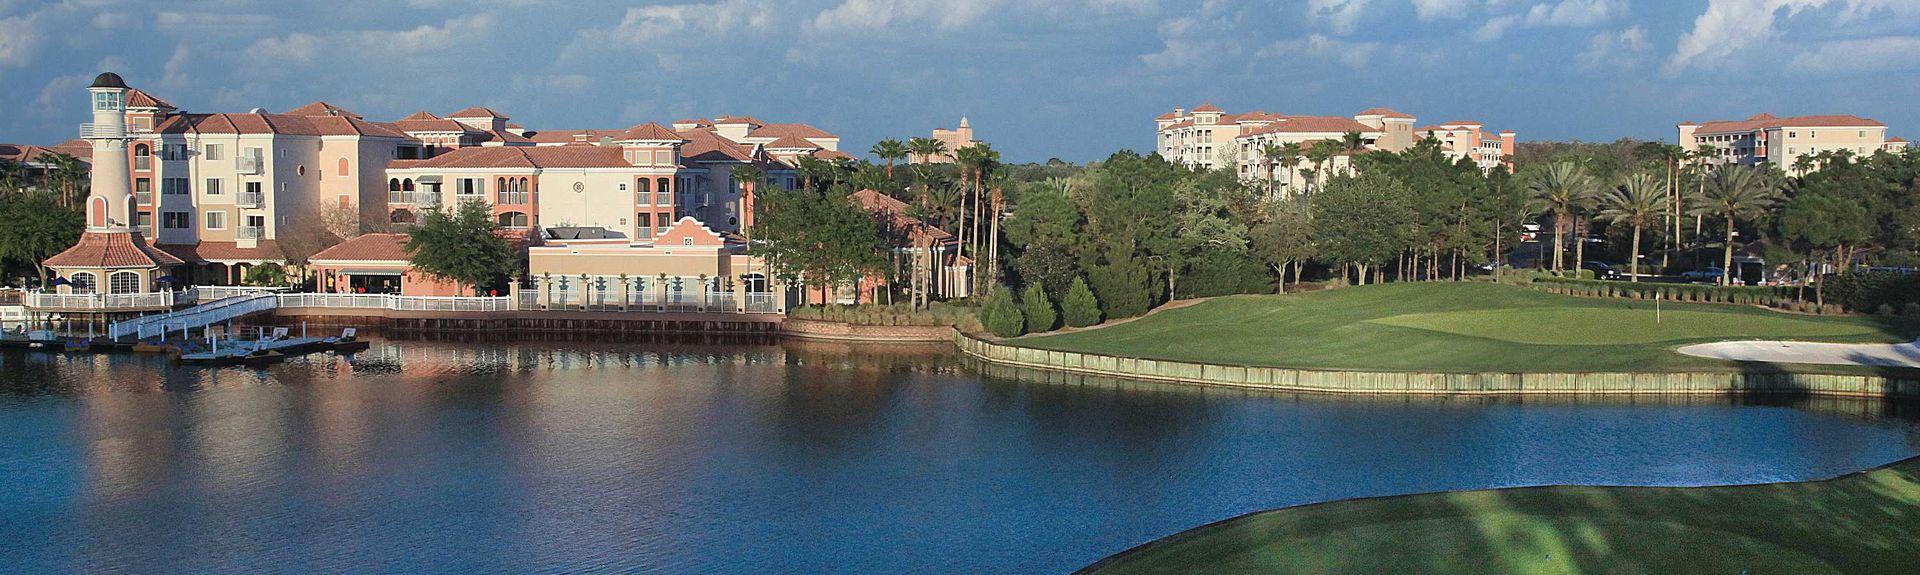 Marriotts Grande Vista (Williamsburg, Florida, USA)